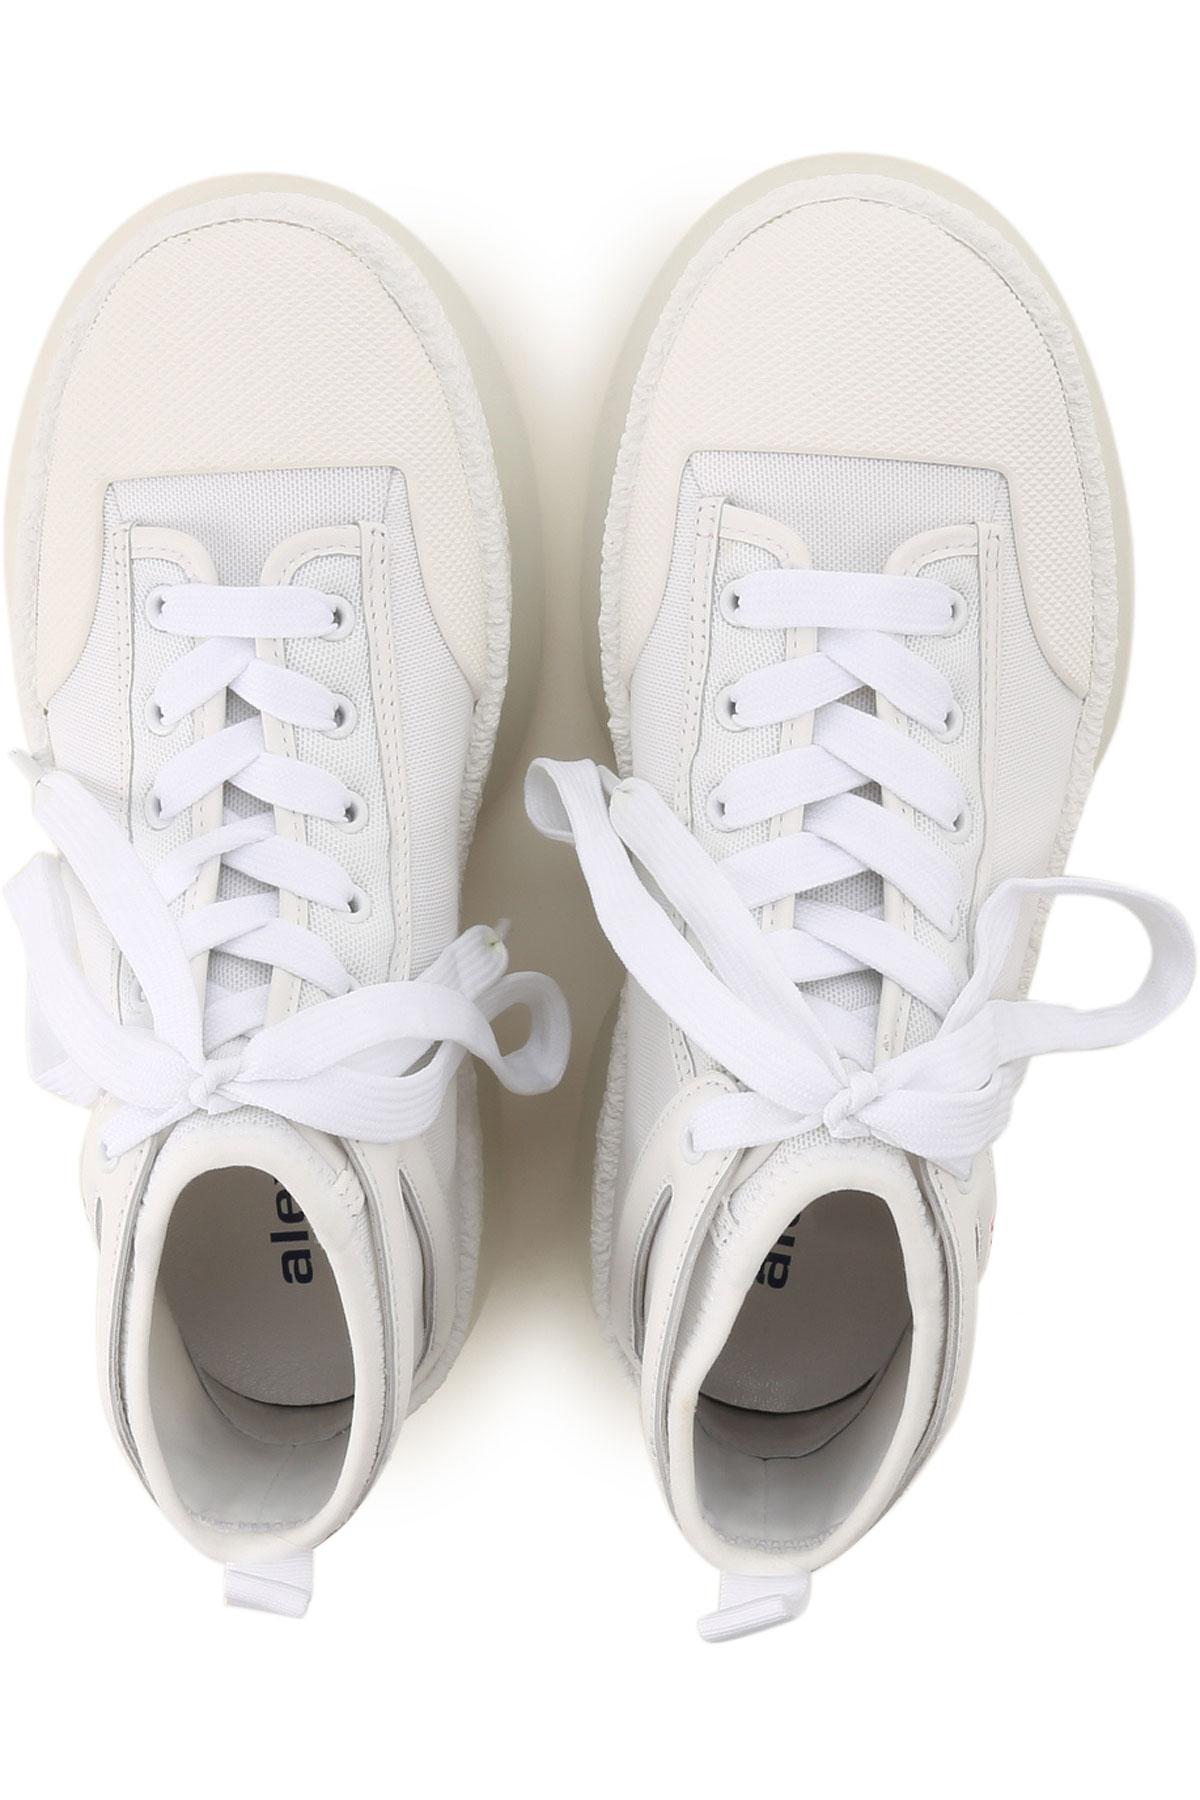 2019 Alexander Blanco Wang Para nbsp; Mujer Primavera Zapatos verano nnBFq1xRf